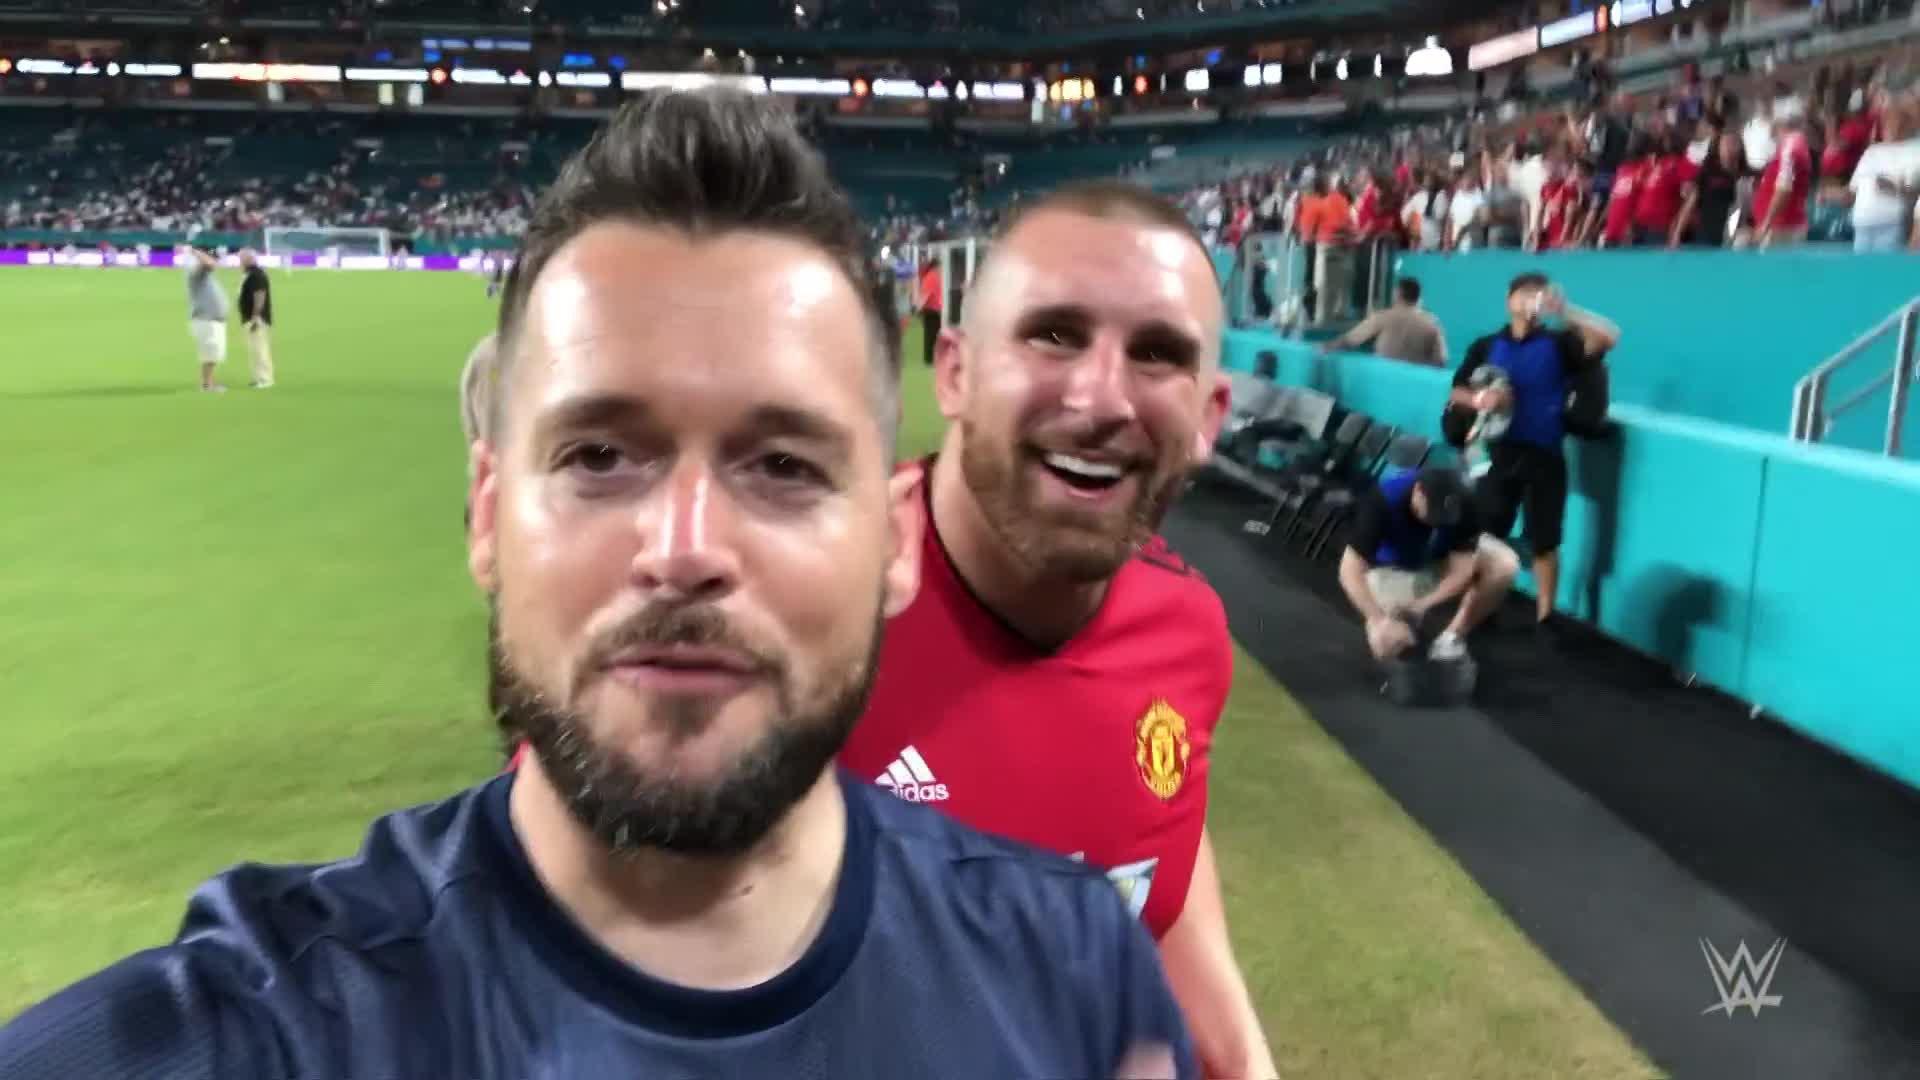 Mojo Rawley, Mike Rome présents à Manchester United vs. Real Madrid